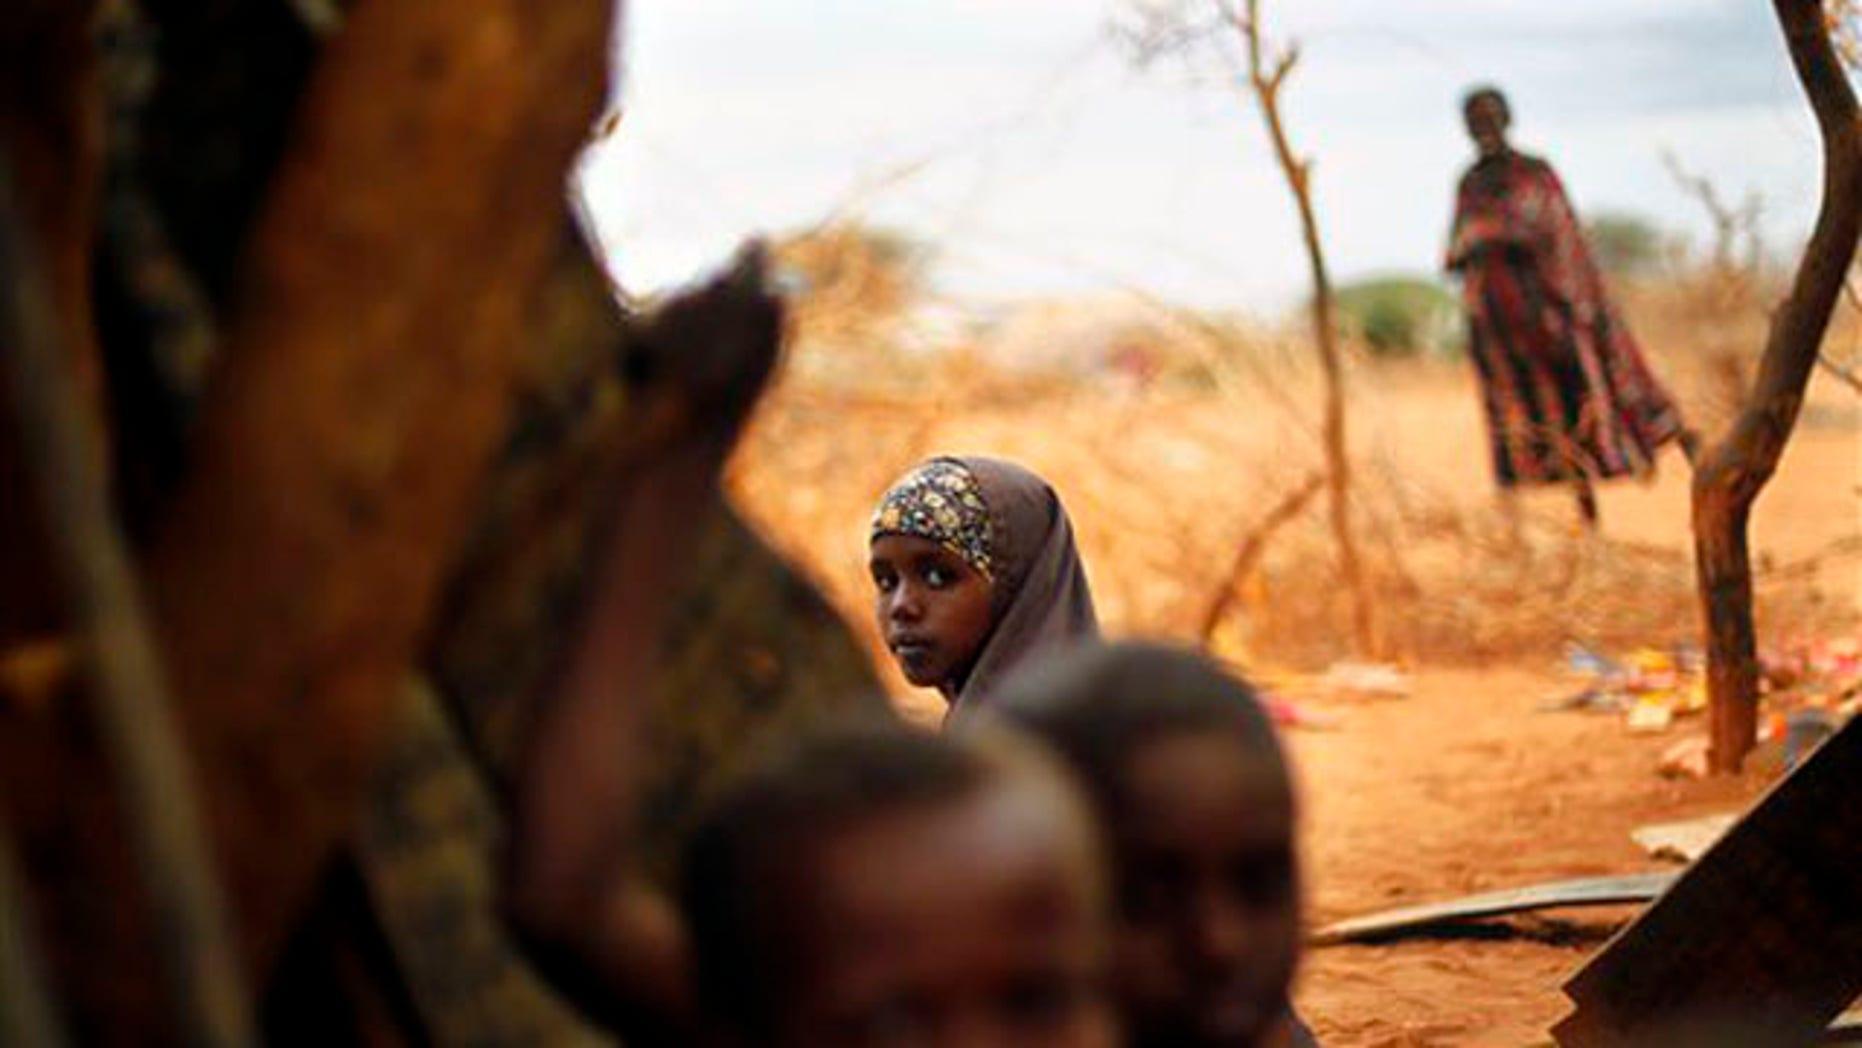 Tuesday: A Somali refugee sits at an outdoor madrasa at the Ifo camp outside Dadaab, Eastern Kenya.